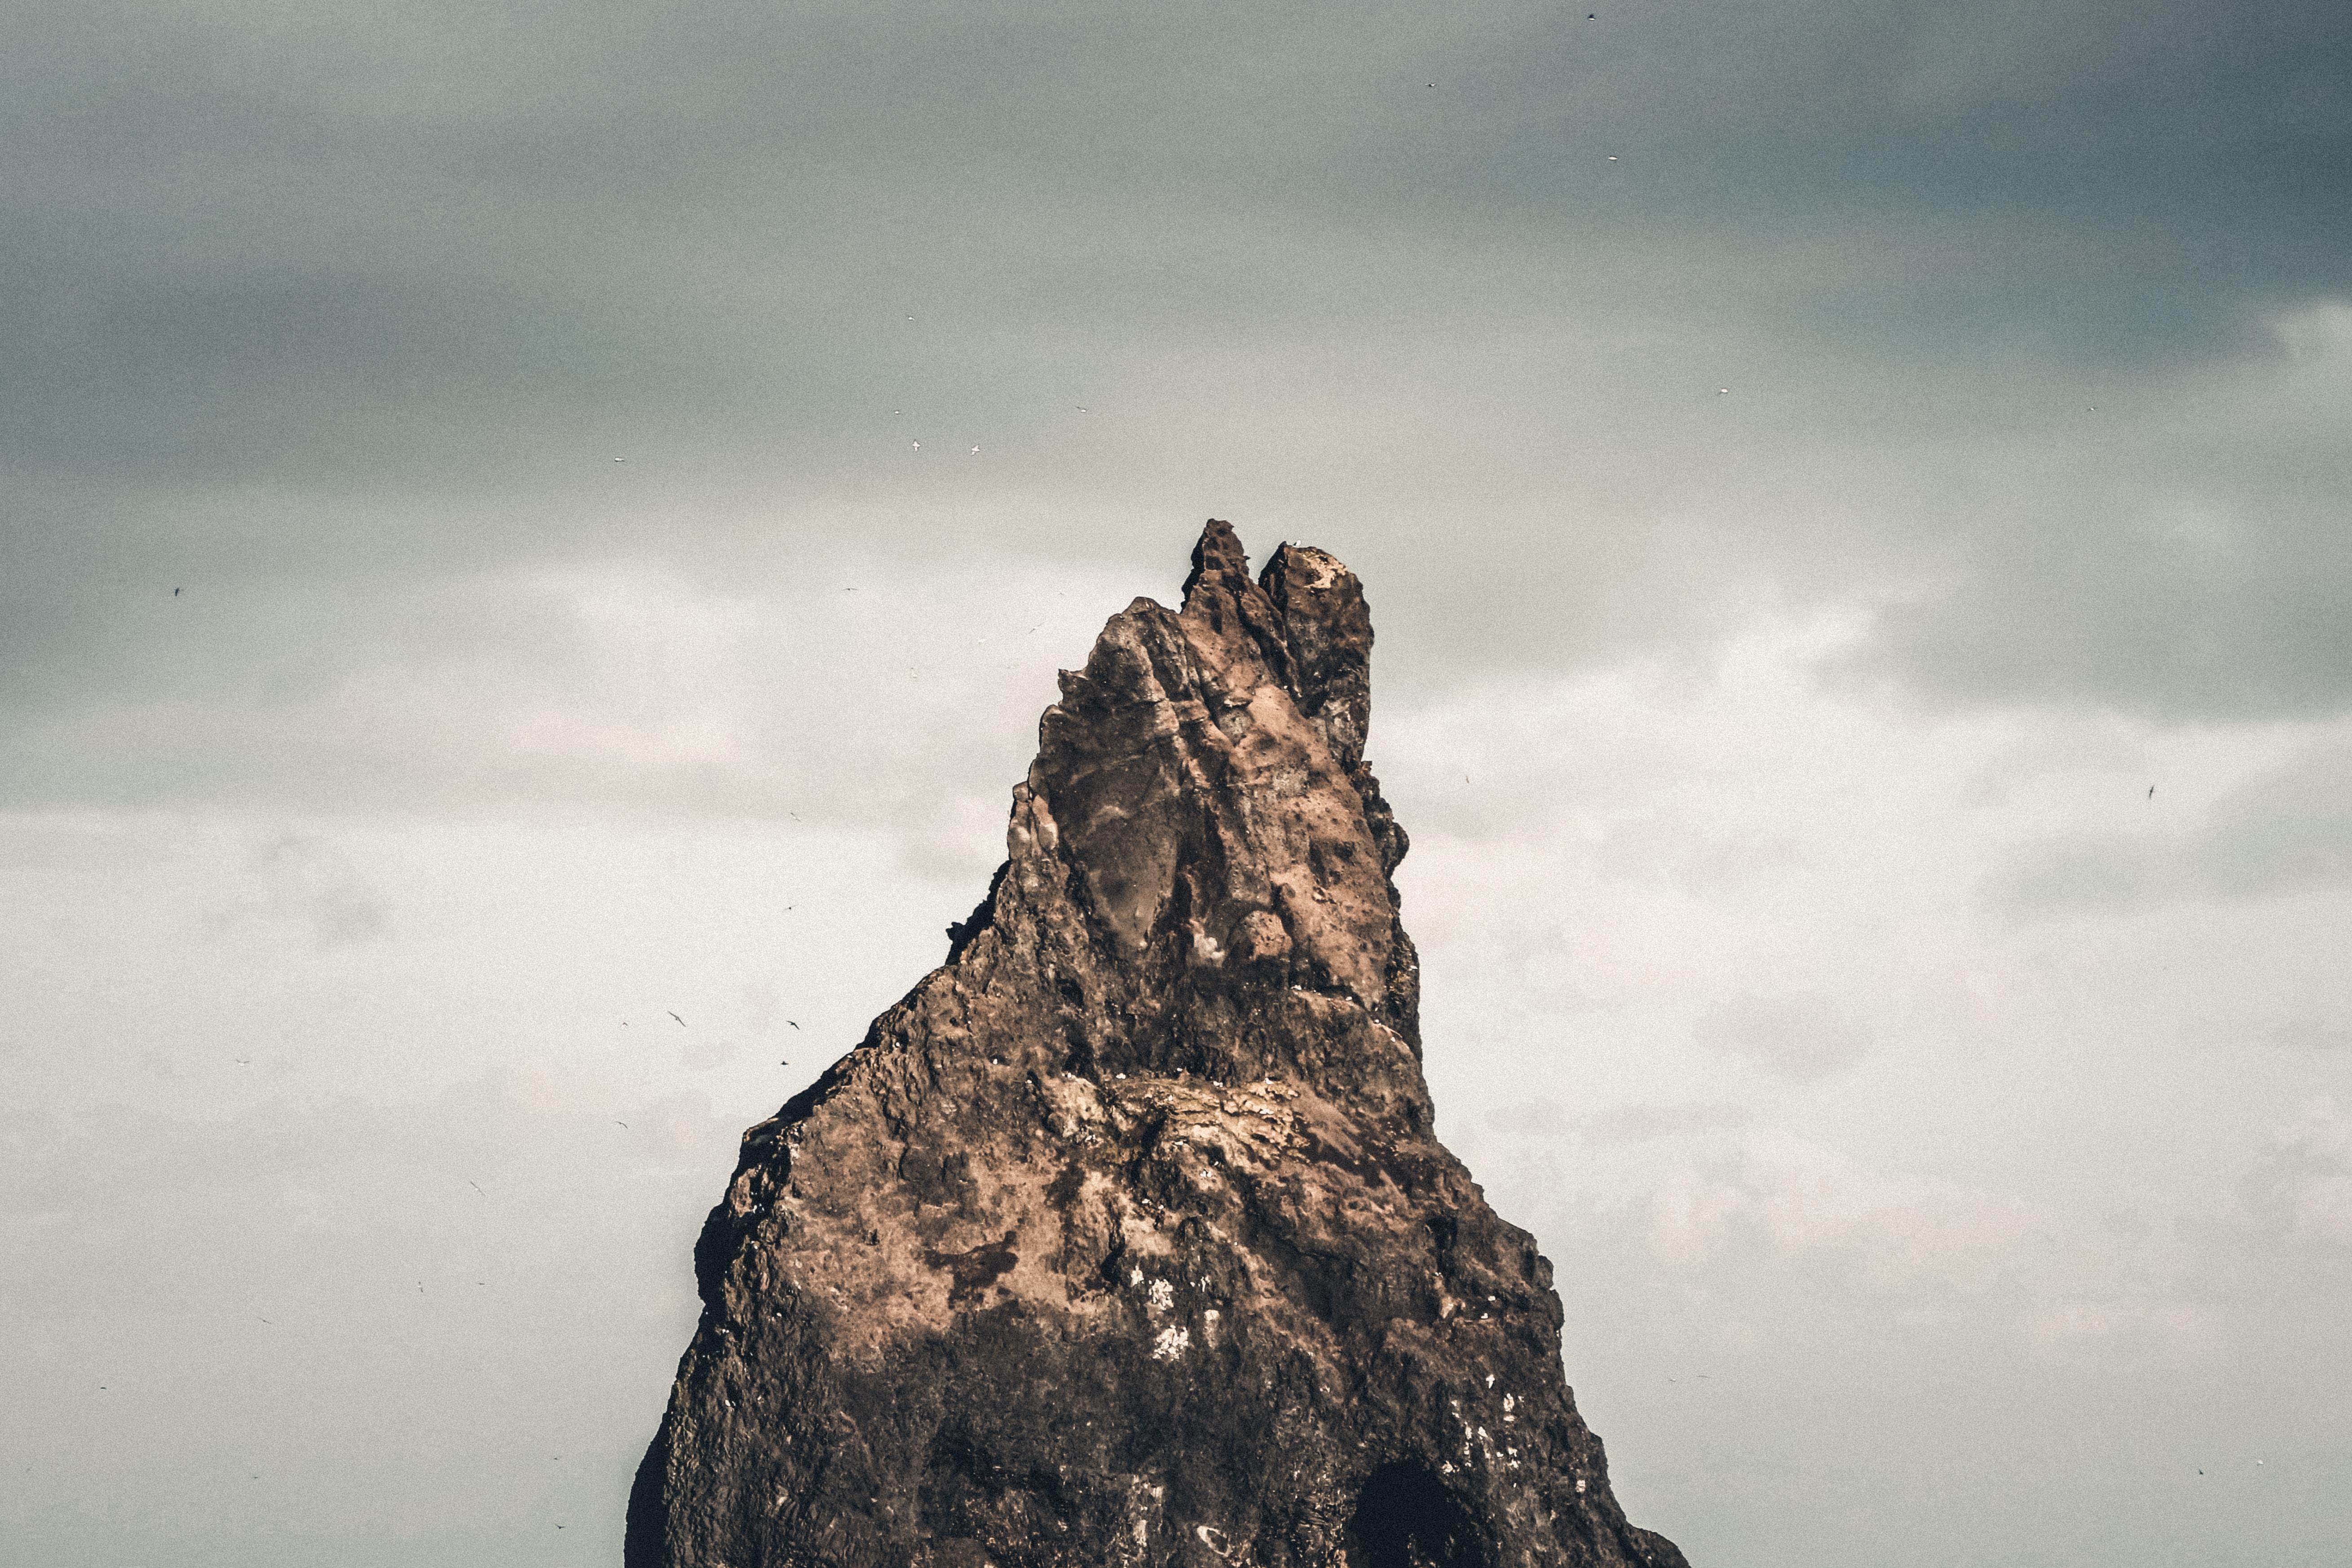 rocky mountain peak under cloudy sky